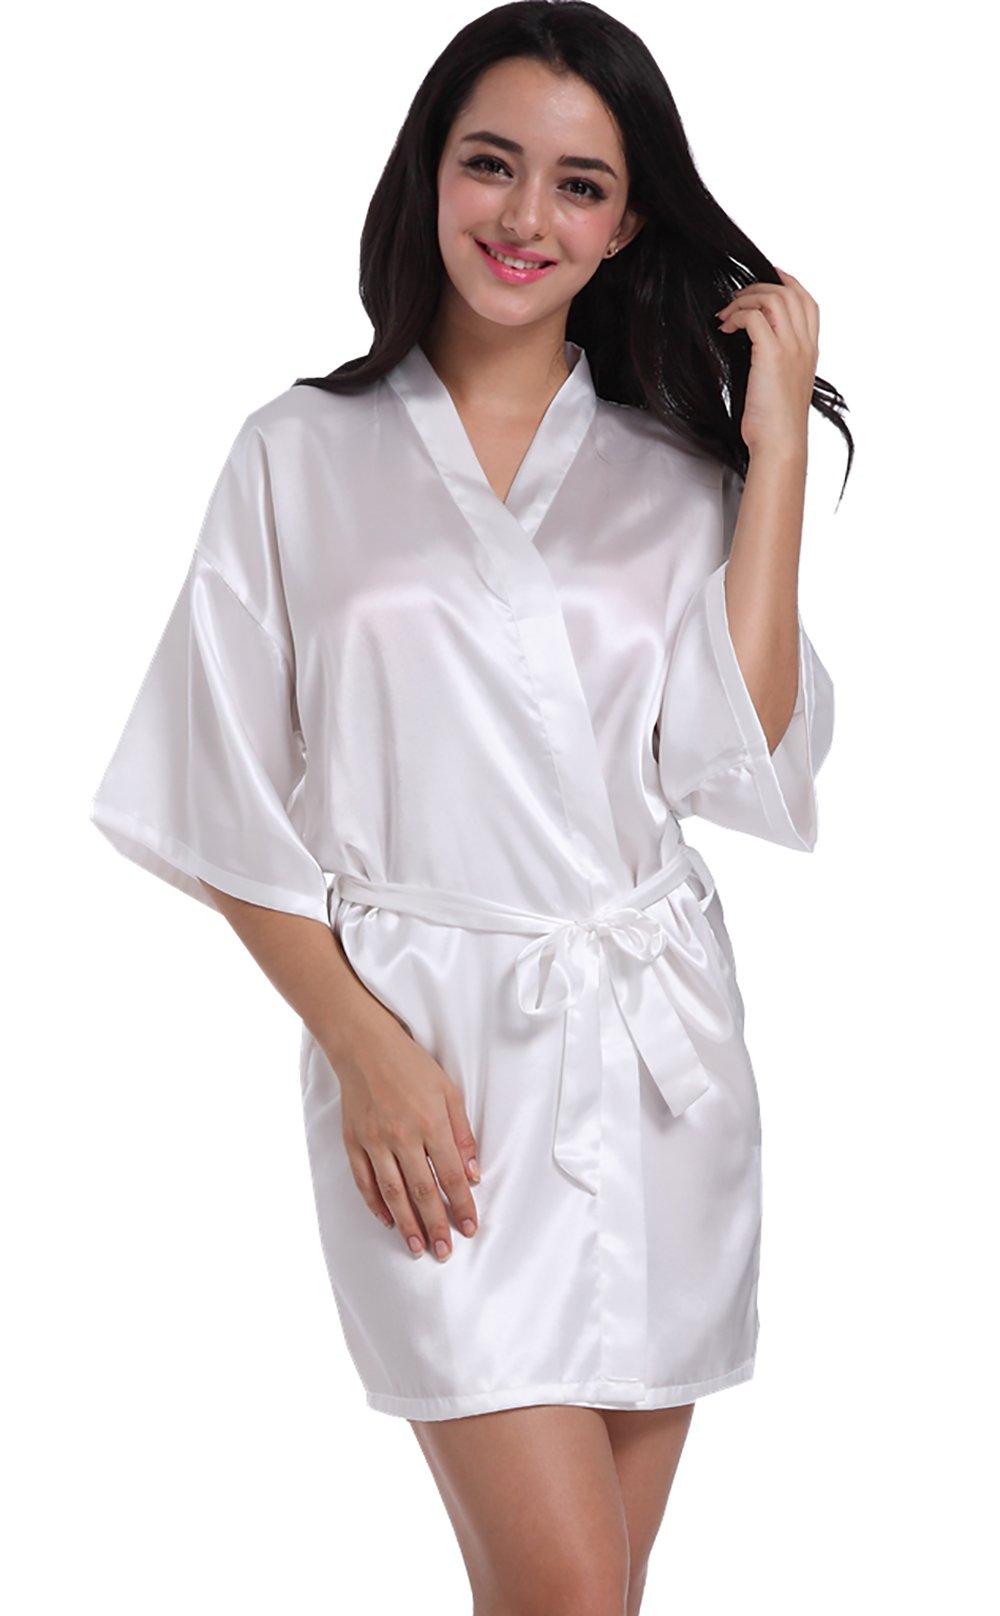 Admireme Women's Kimono Robes Satin Nightdress Pure Colour Short style with Oblique V-Neck white medium short